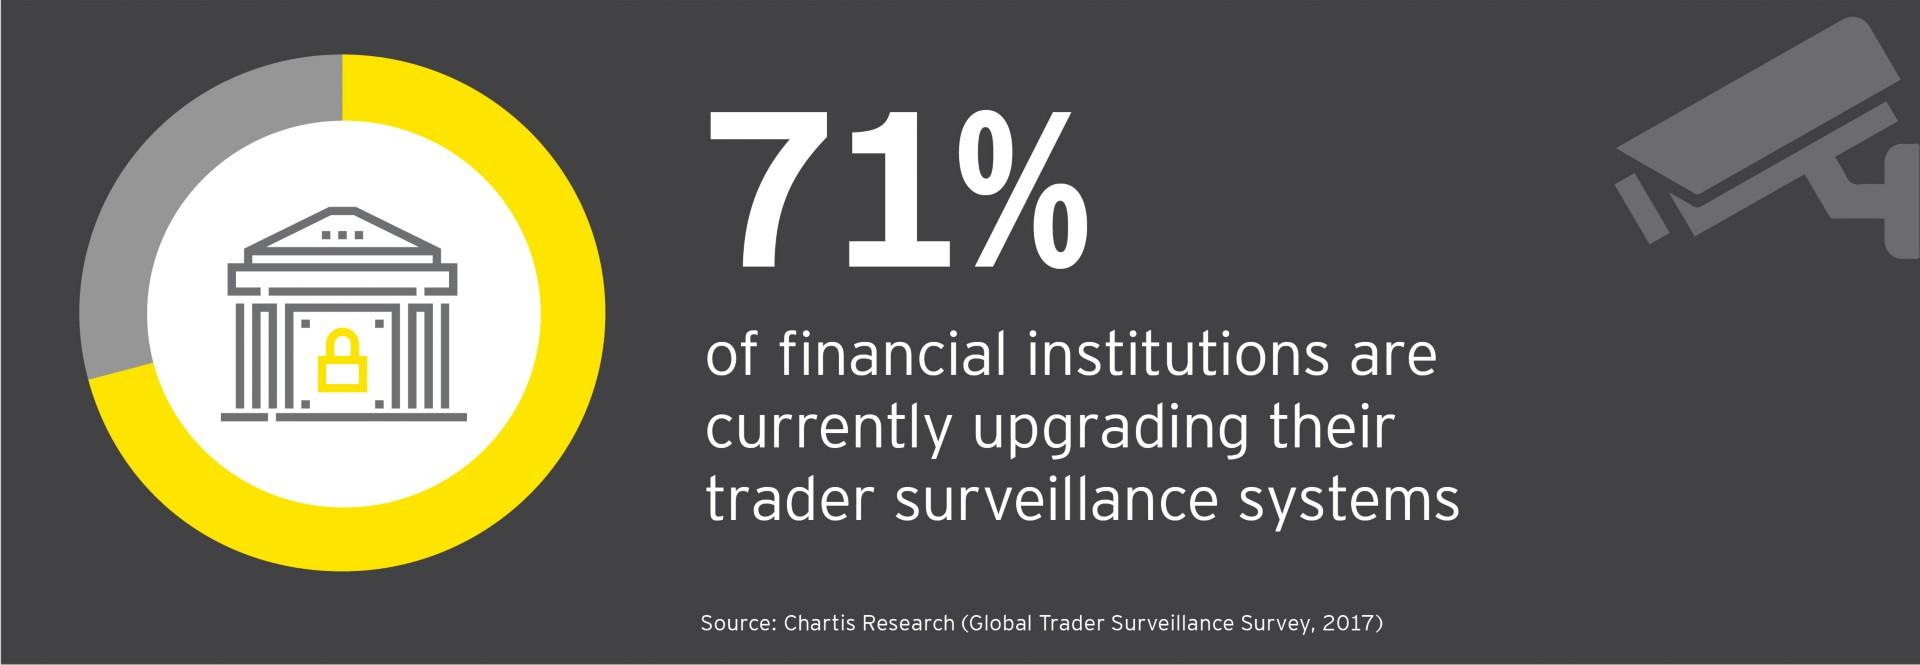 Trader surveillance report image 3